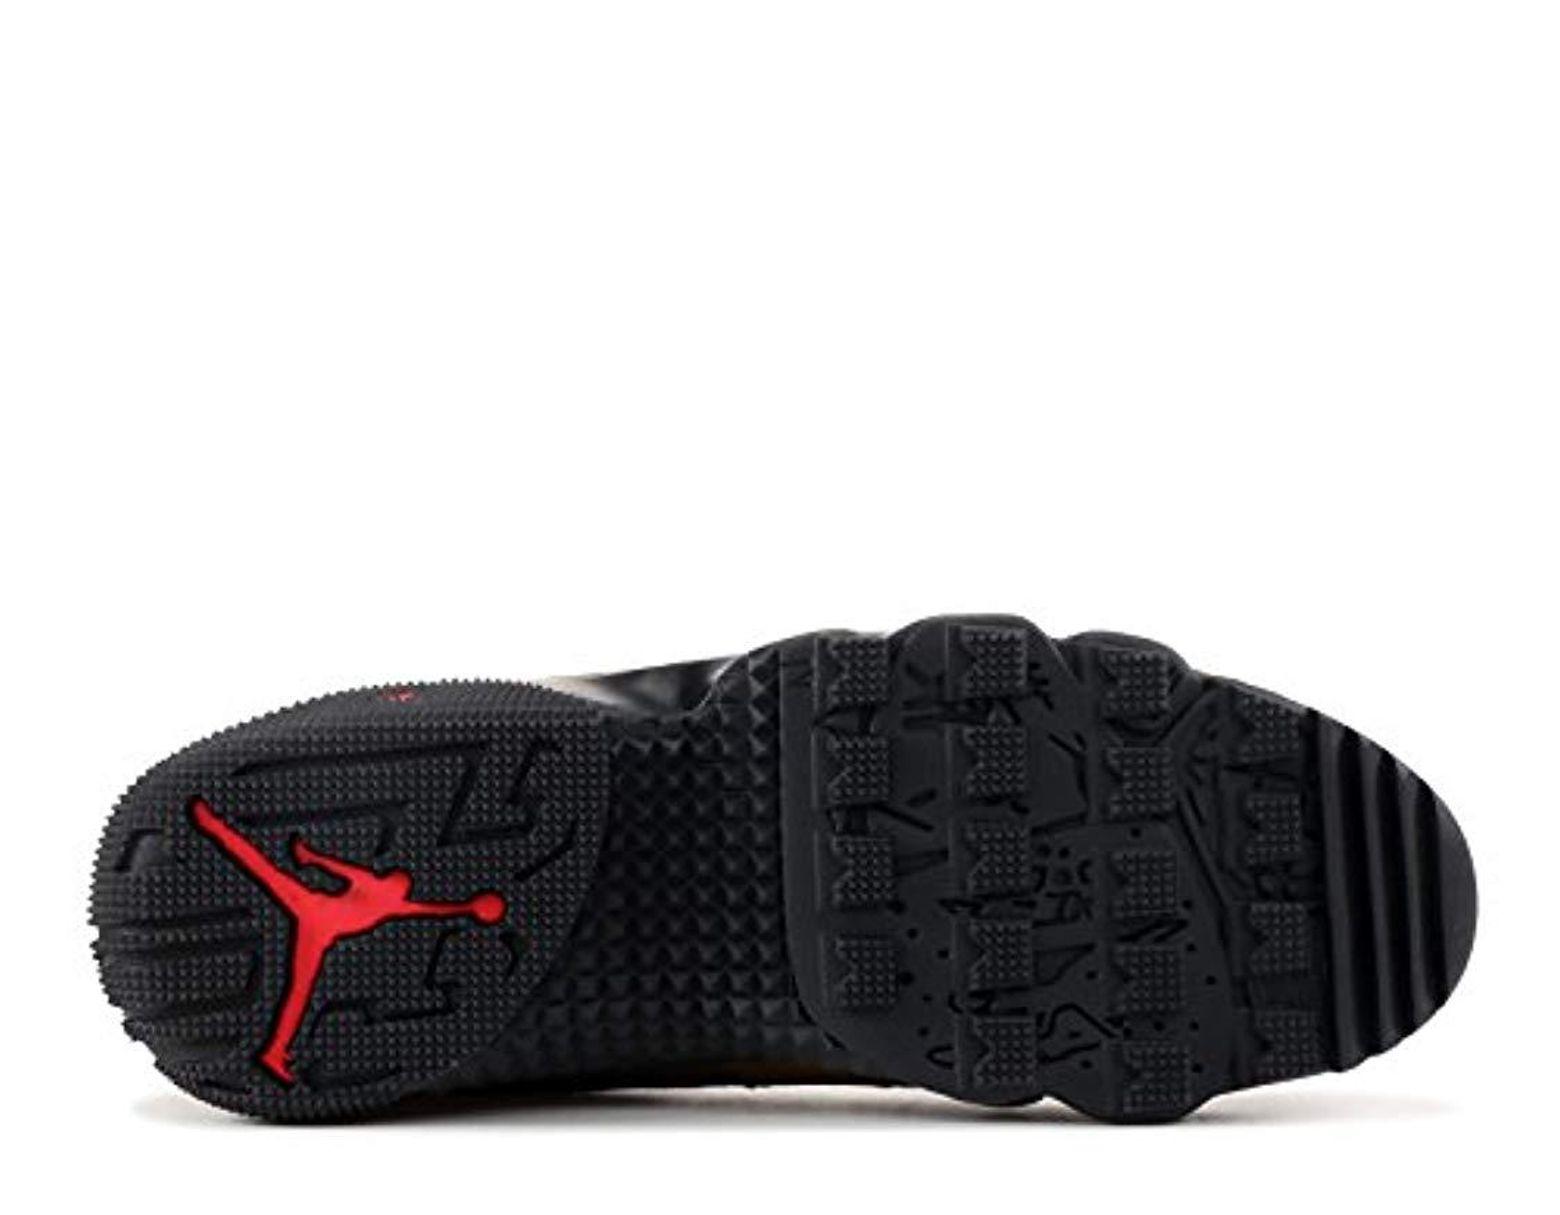 cheaper 0481e d3aac Men's Black Air Jordan 9 Retro Boot Nrg